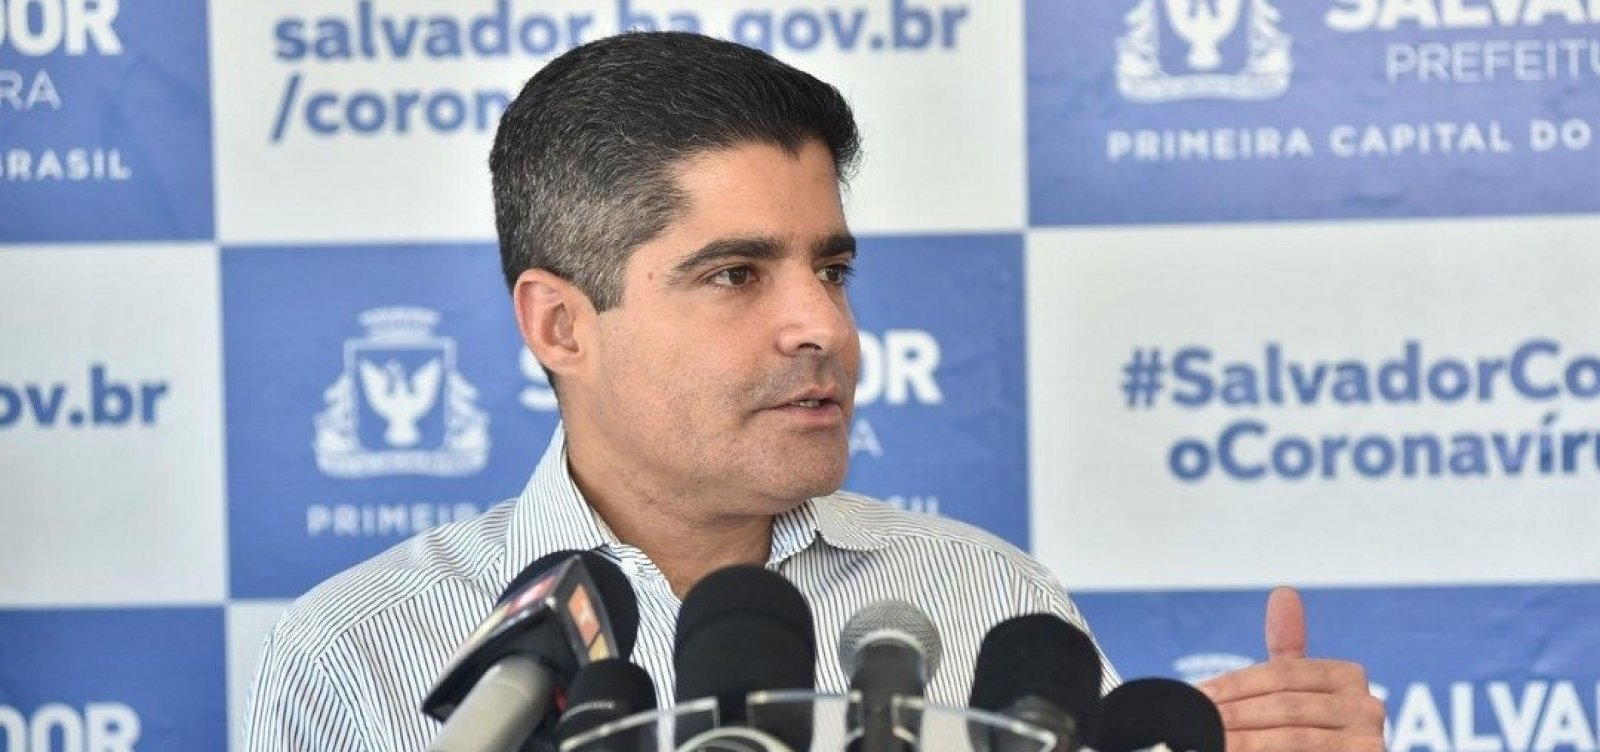 [ACM Neto: 'Brasil já teria superado fase crítica do coronavírus se autoridades tivessem se unido']